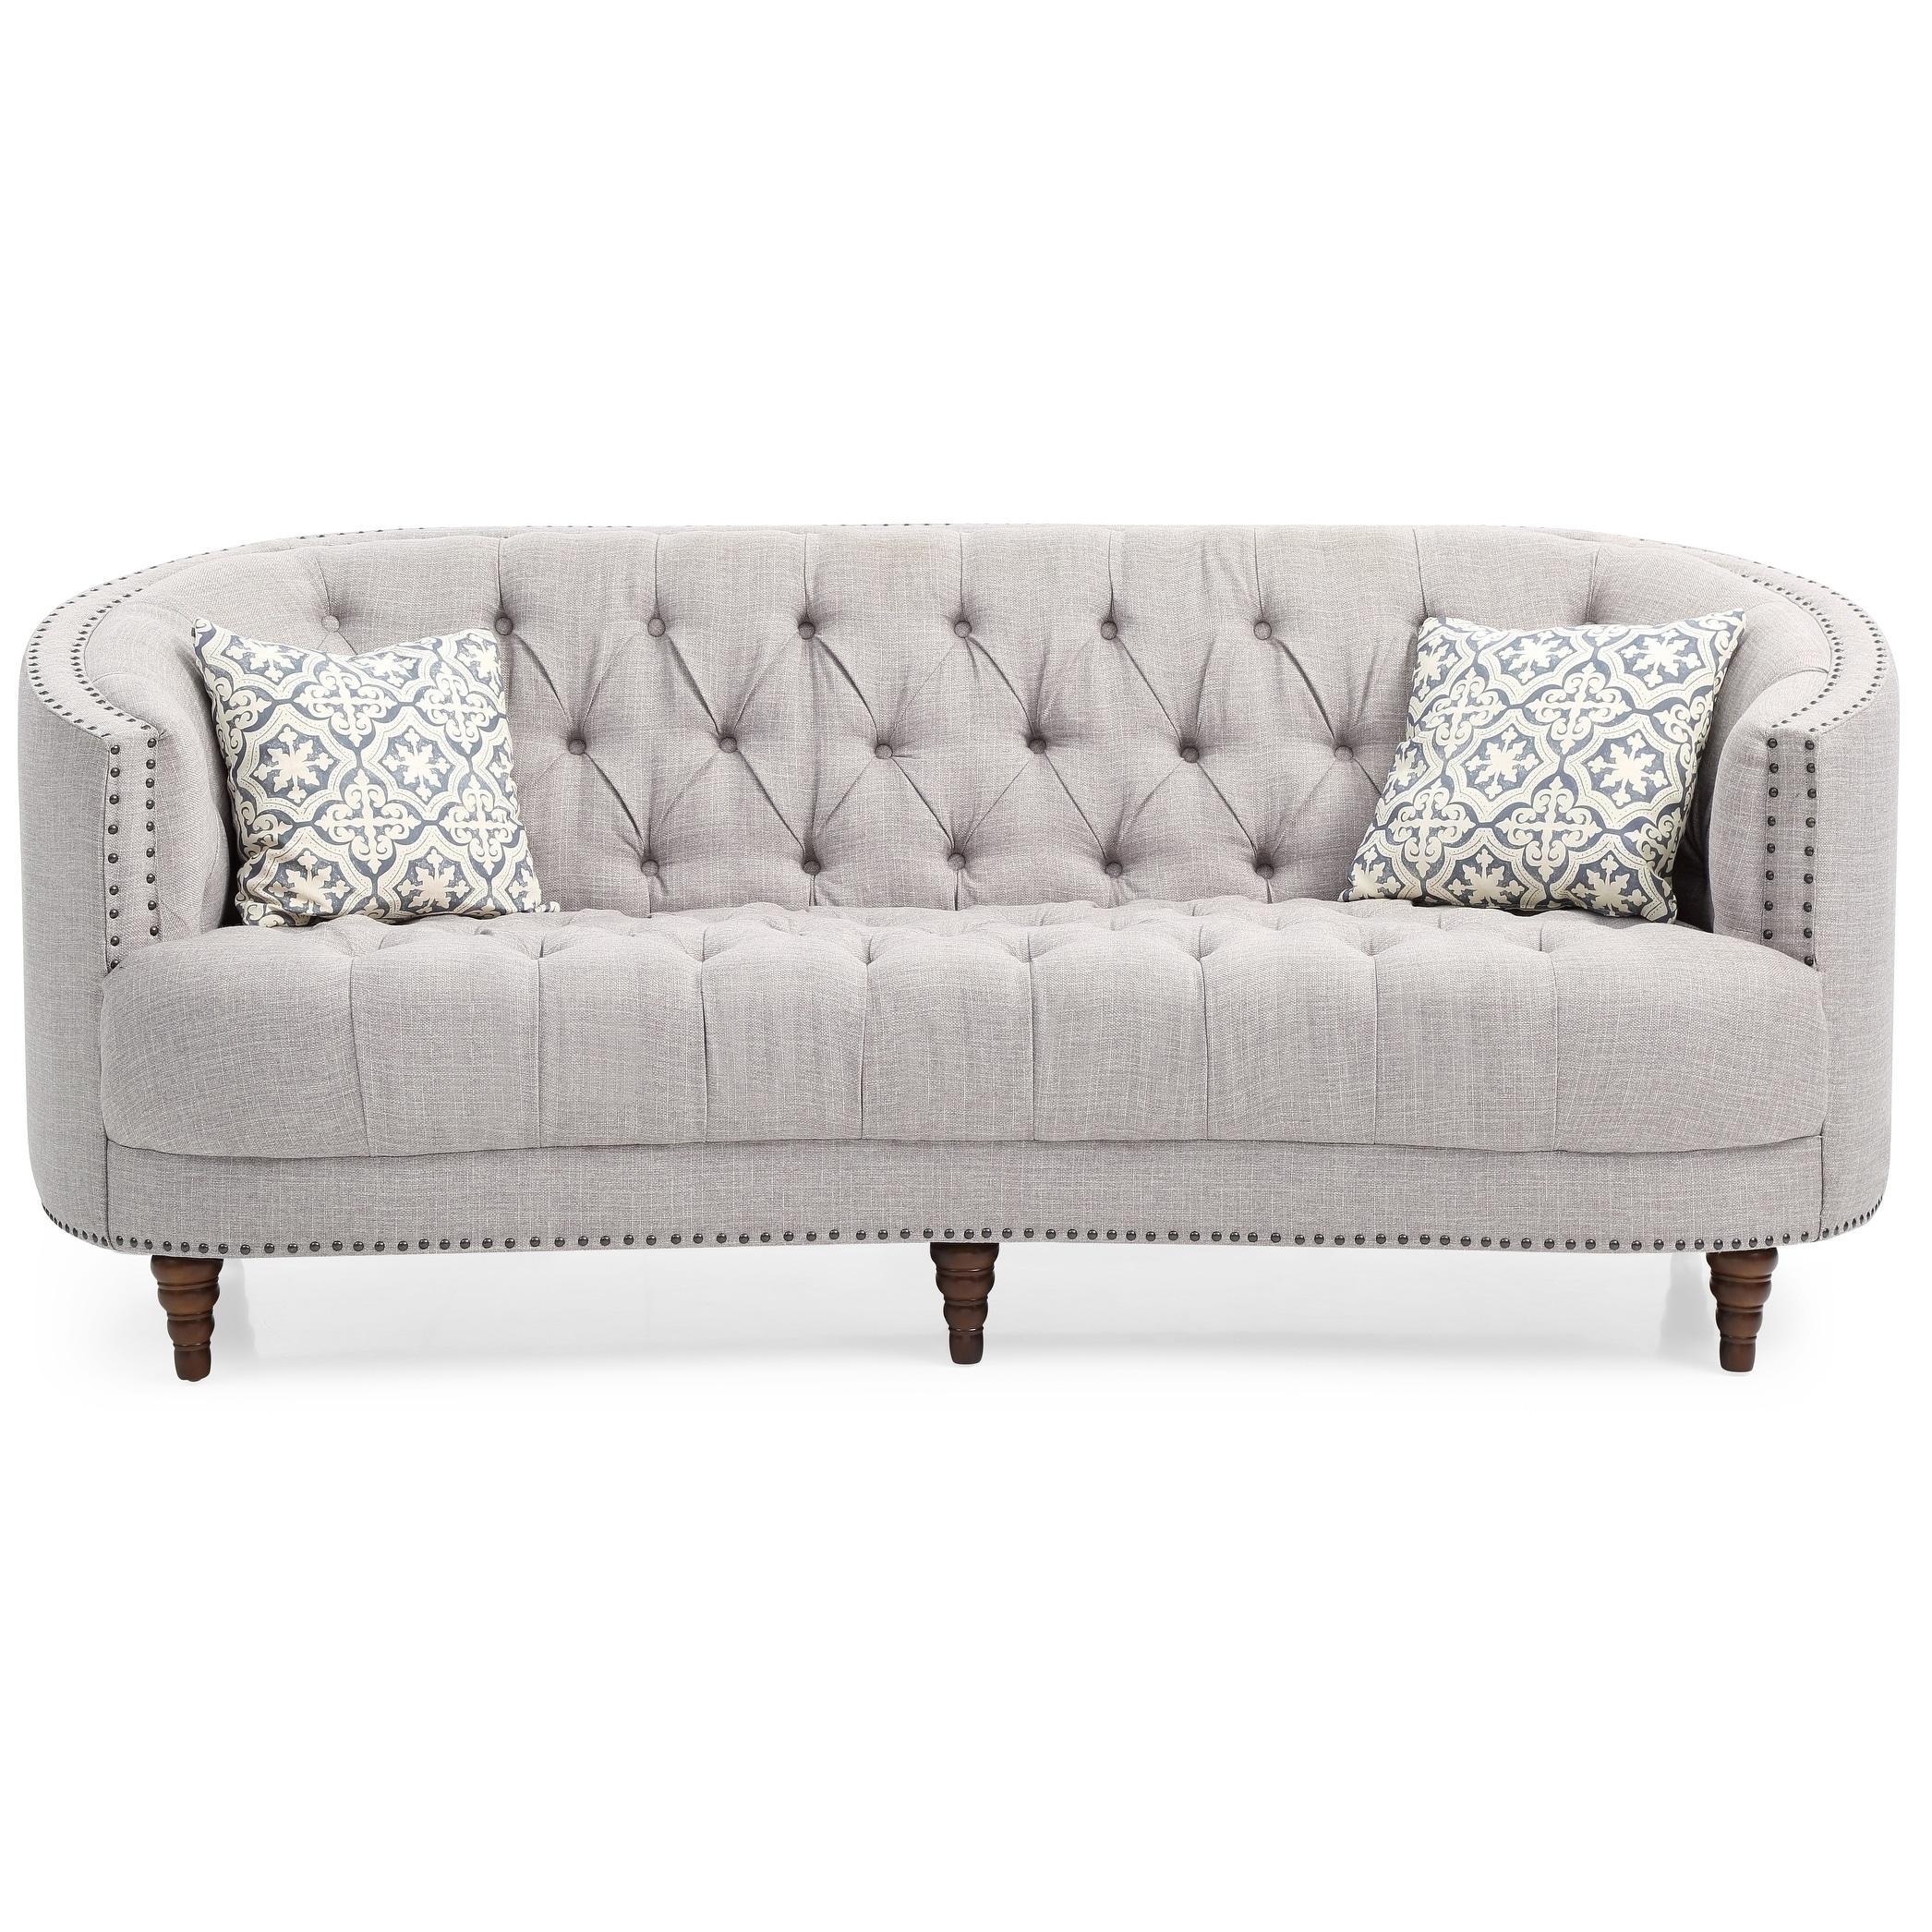 LYKE Home Recessed Arms Grey Sofa